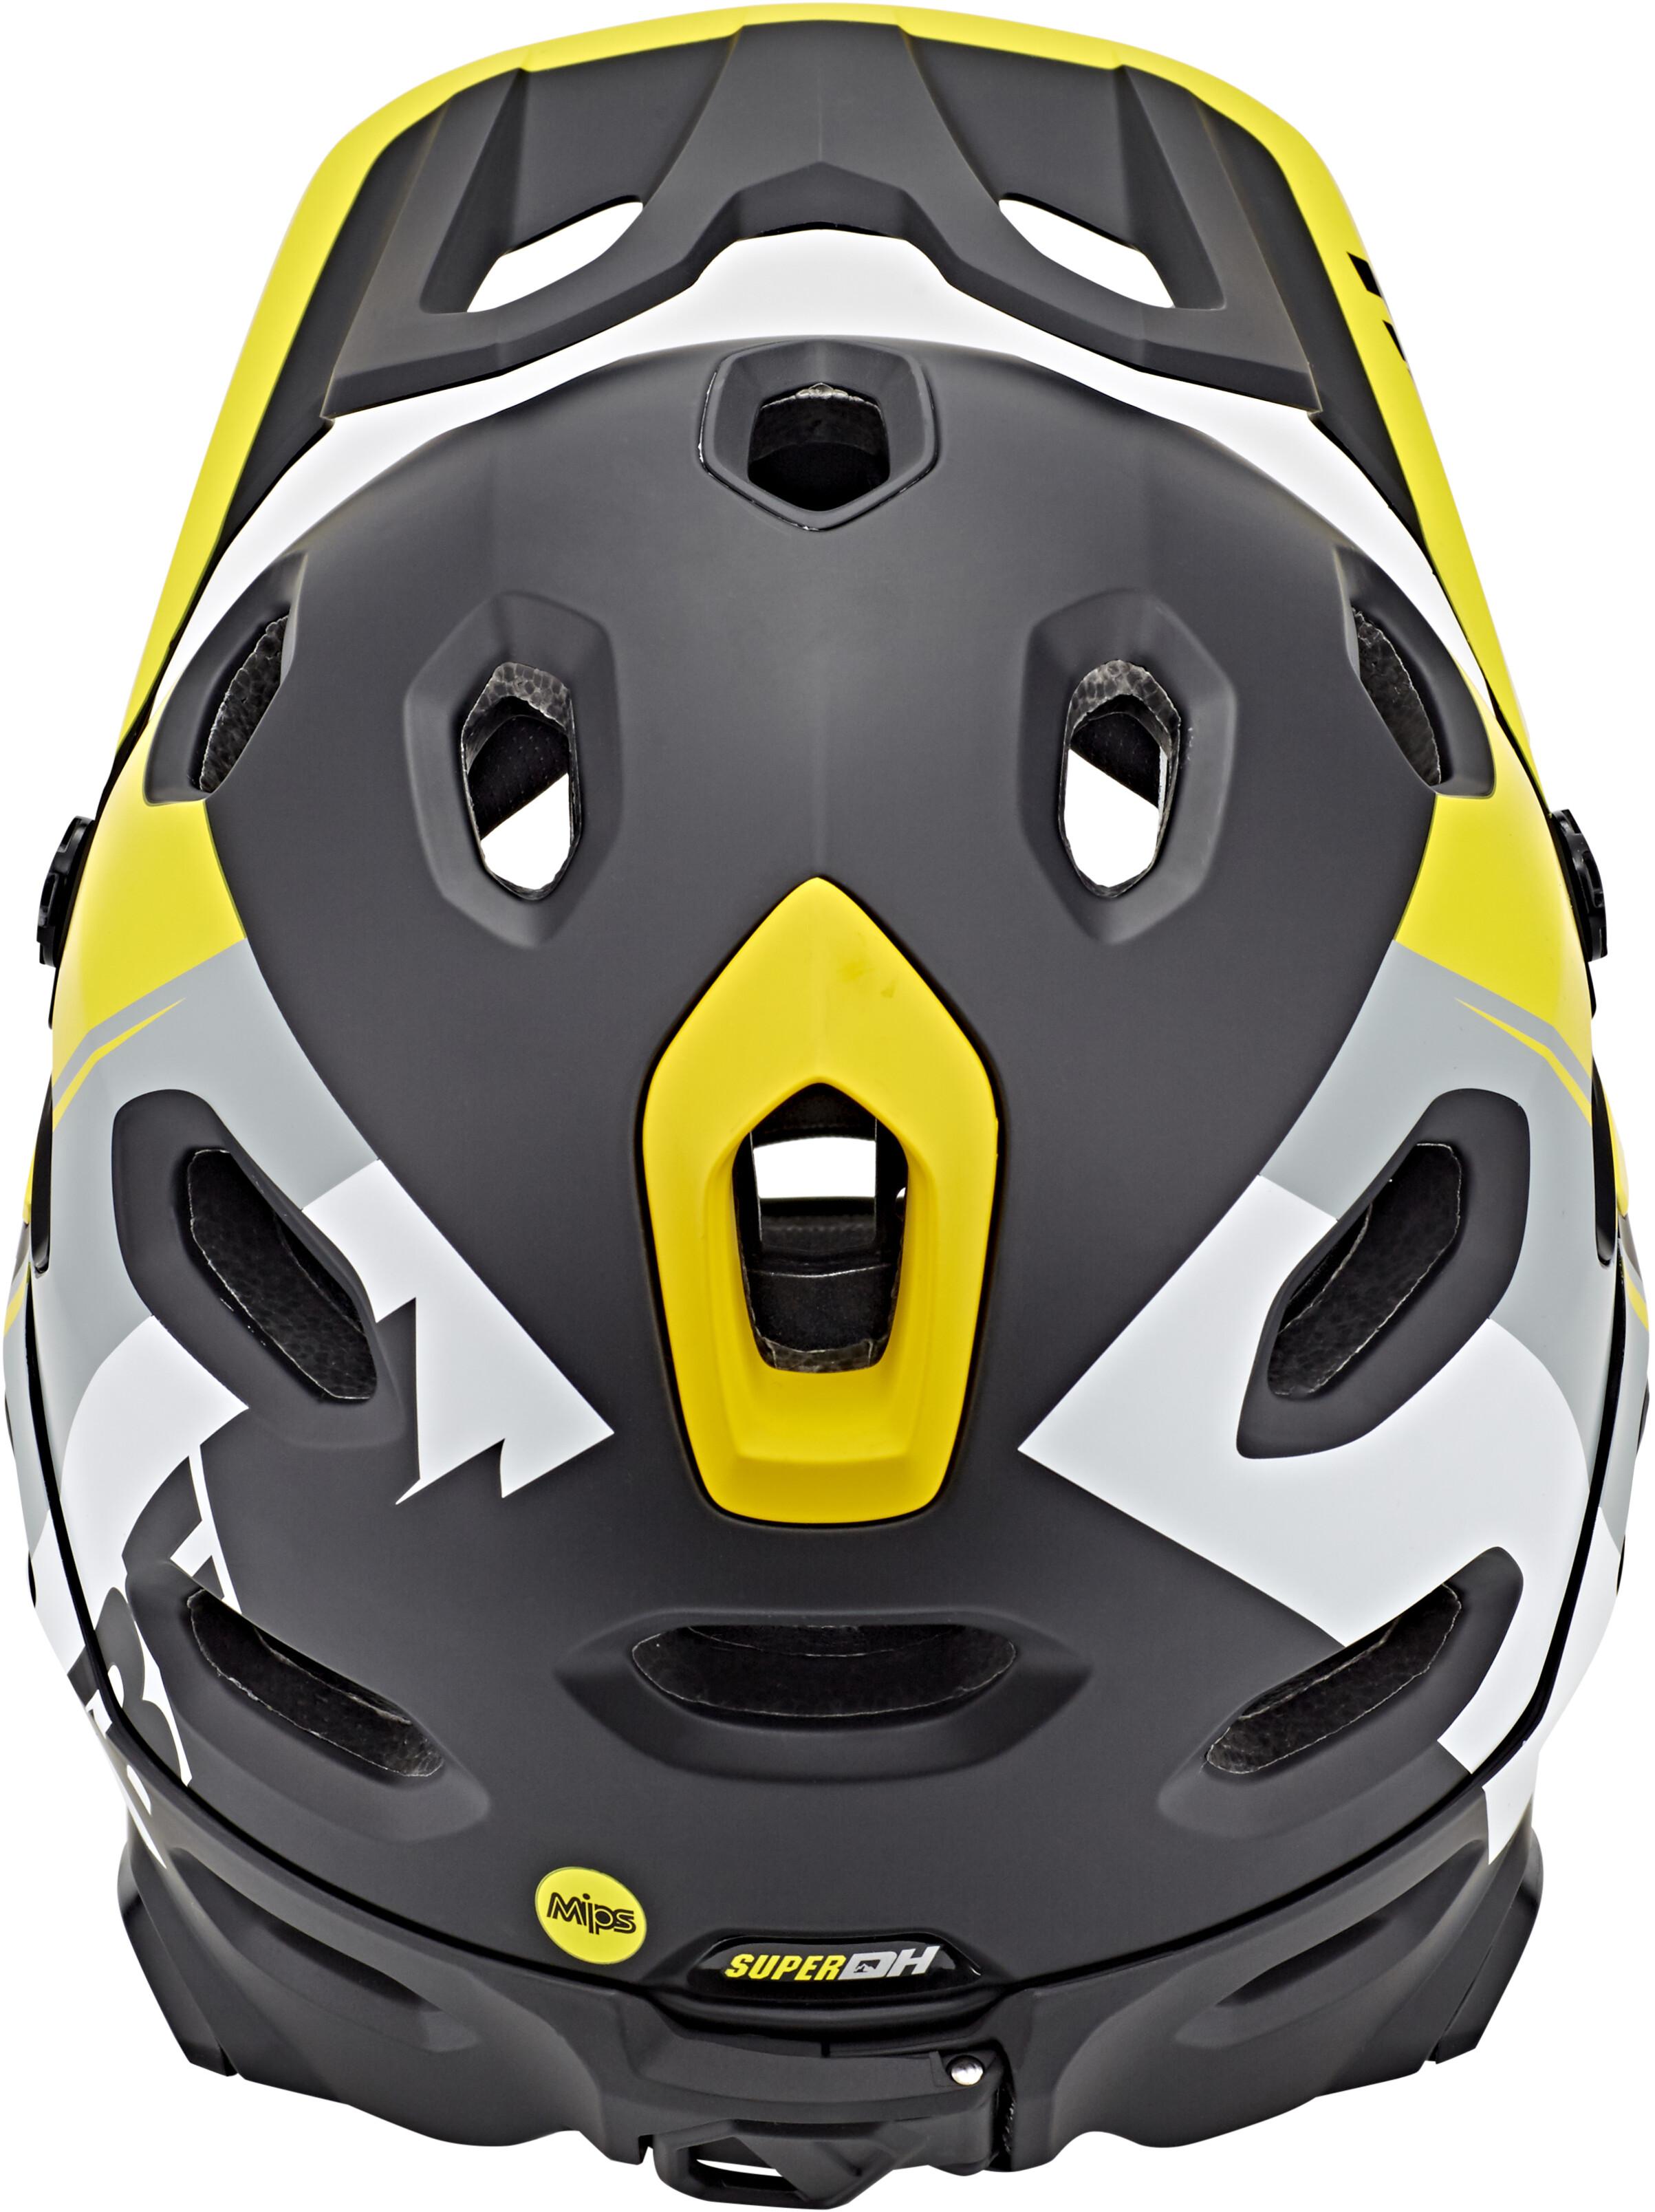 bell super dh mips mtb helmet yellow silver black online. Black Bedroom Furniture Sets. Home Design Ideas